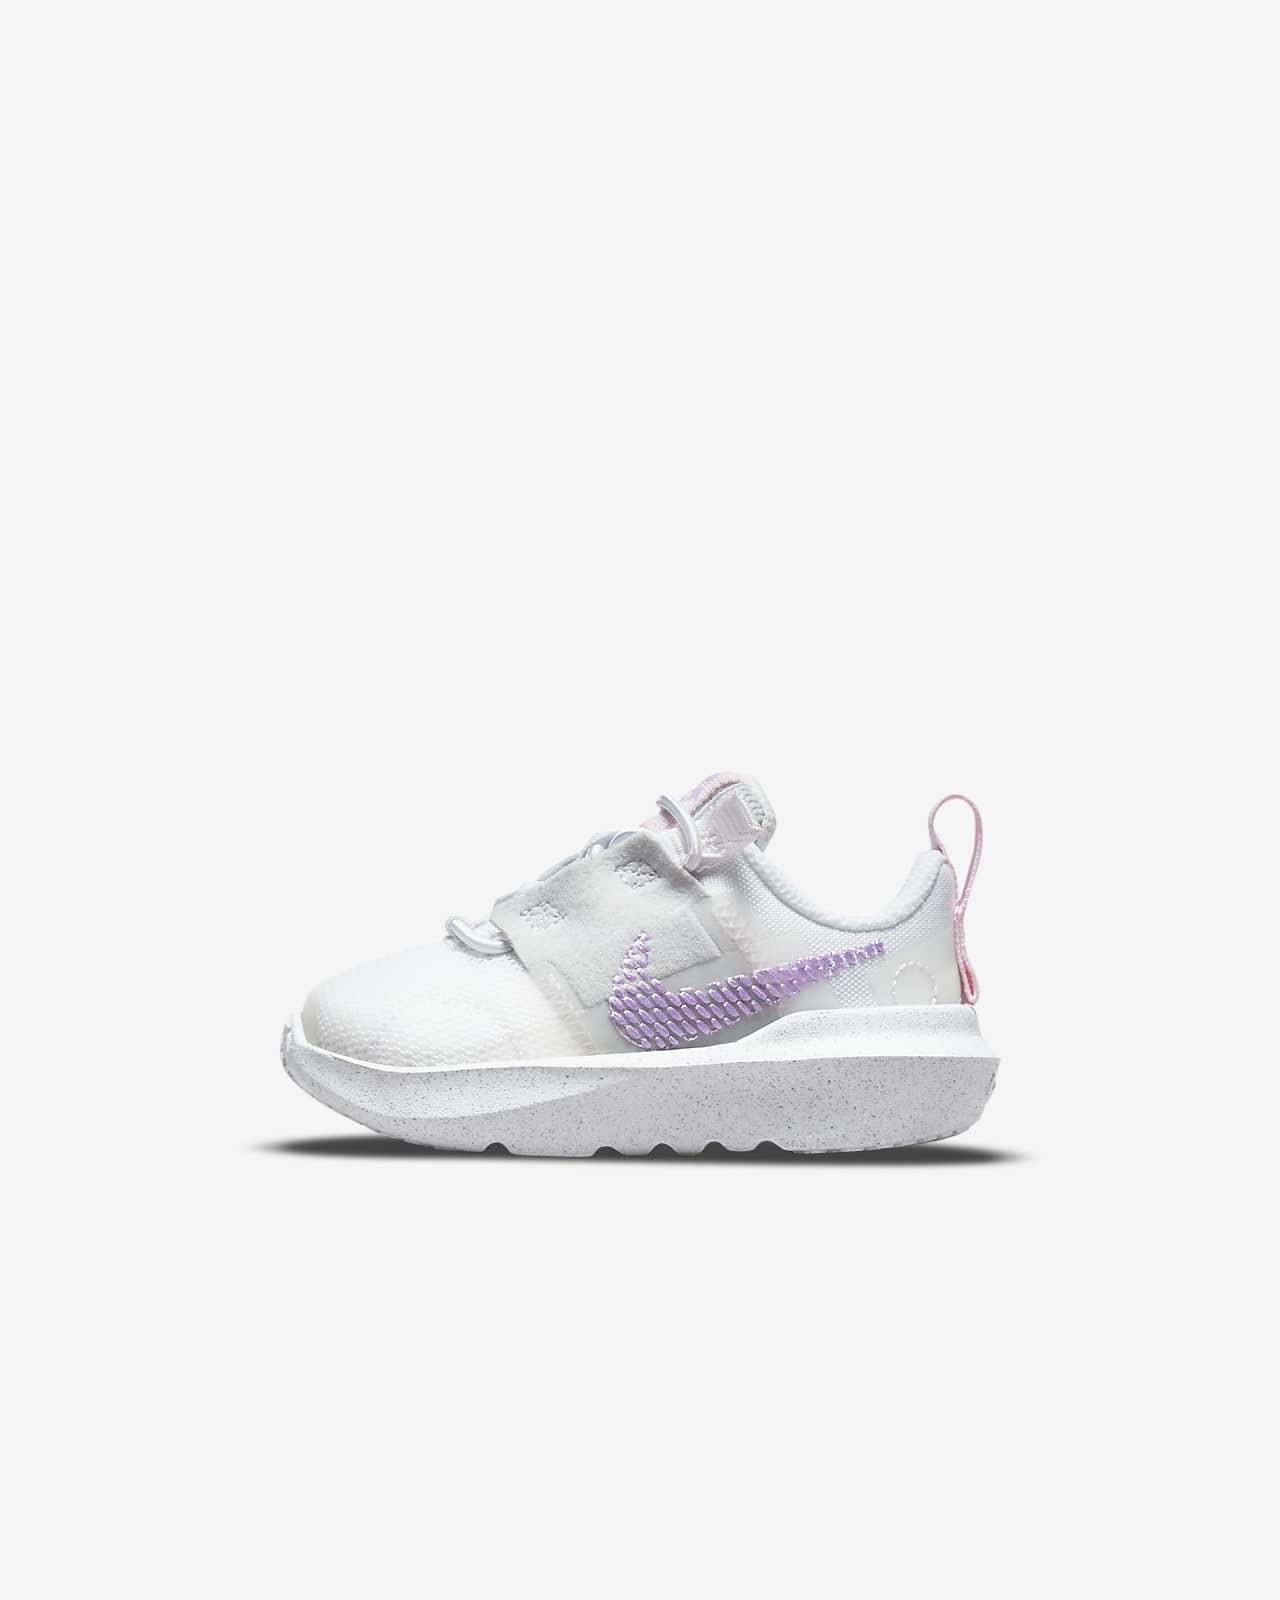 Scarpa Nike Crater Impact - Neonati/Bimbi piccoli